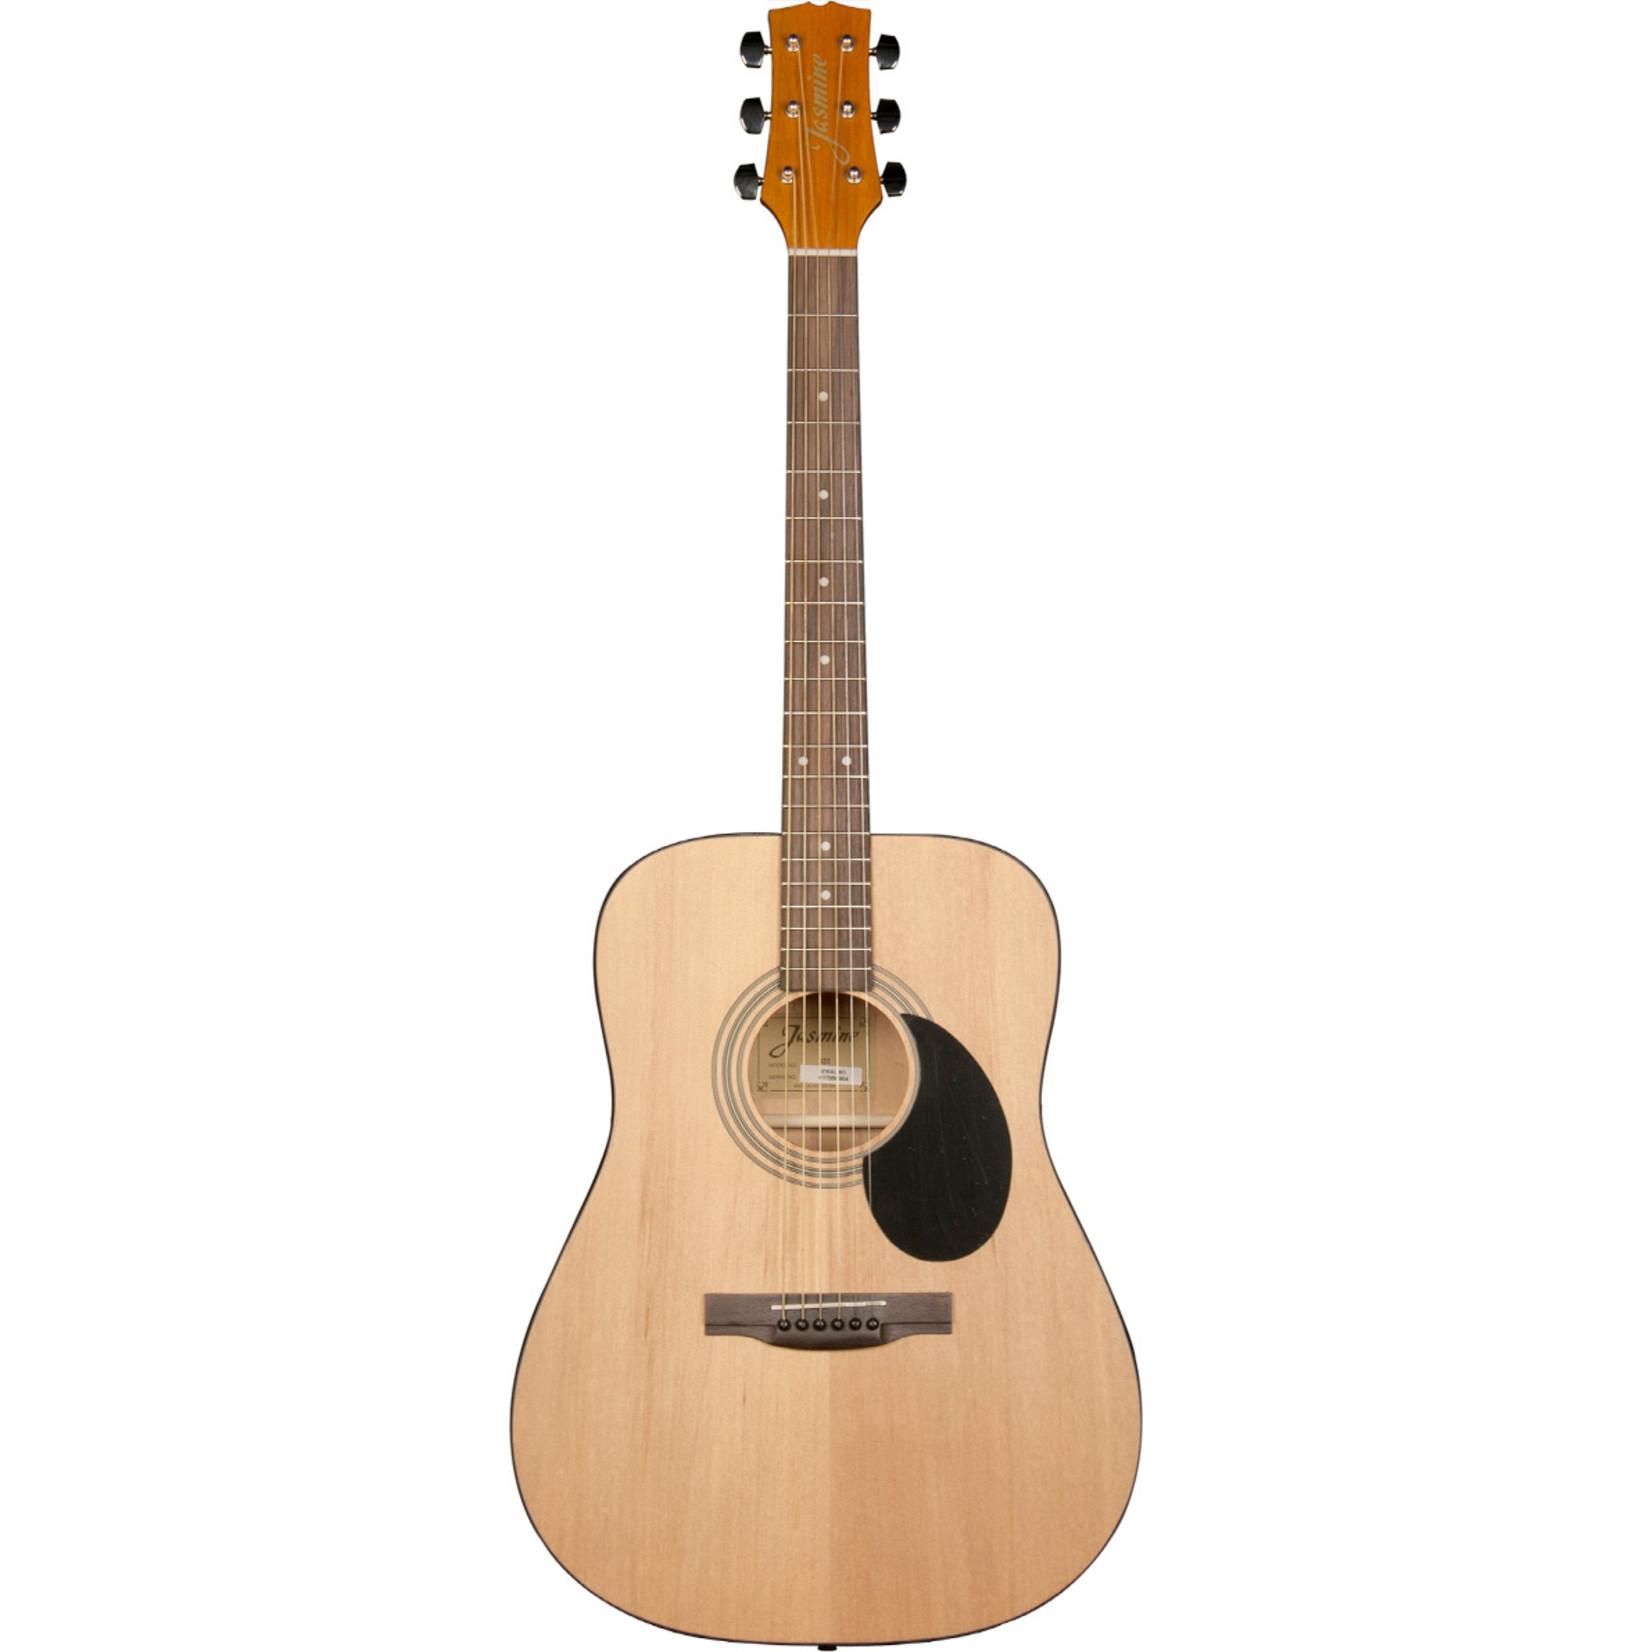 Jasmine Jasmine S35 Acoustic Guitar